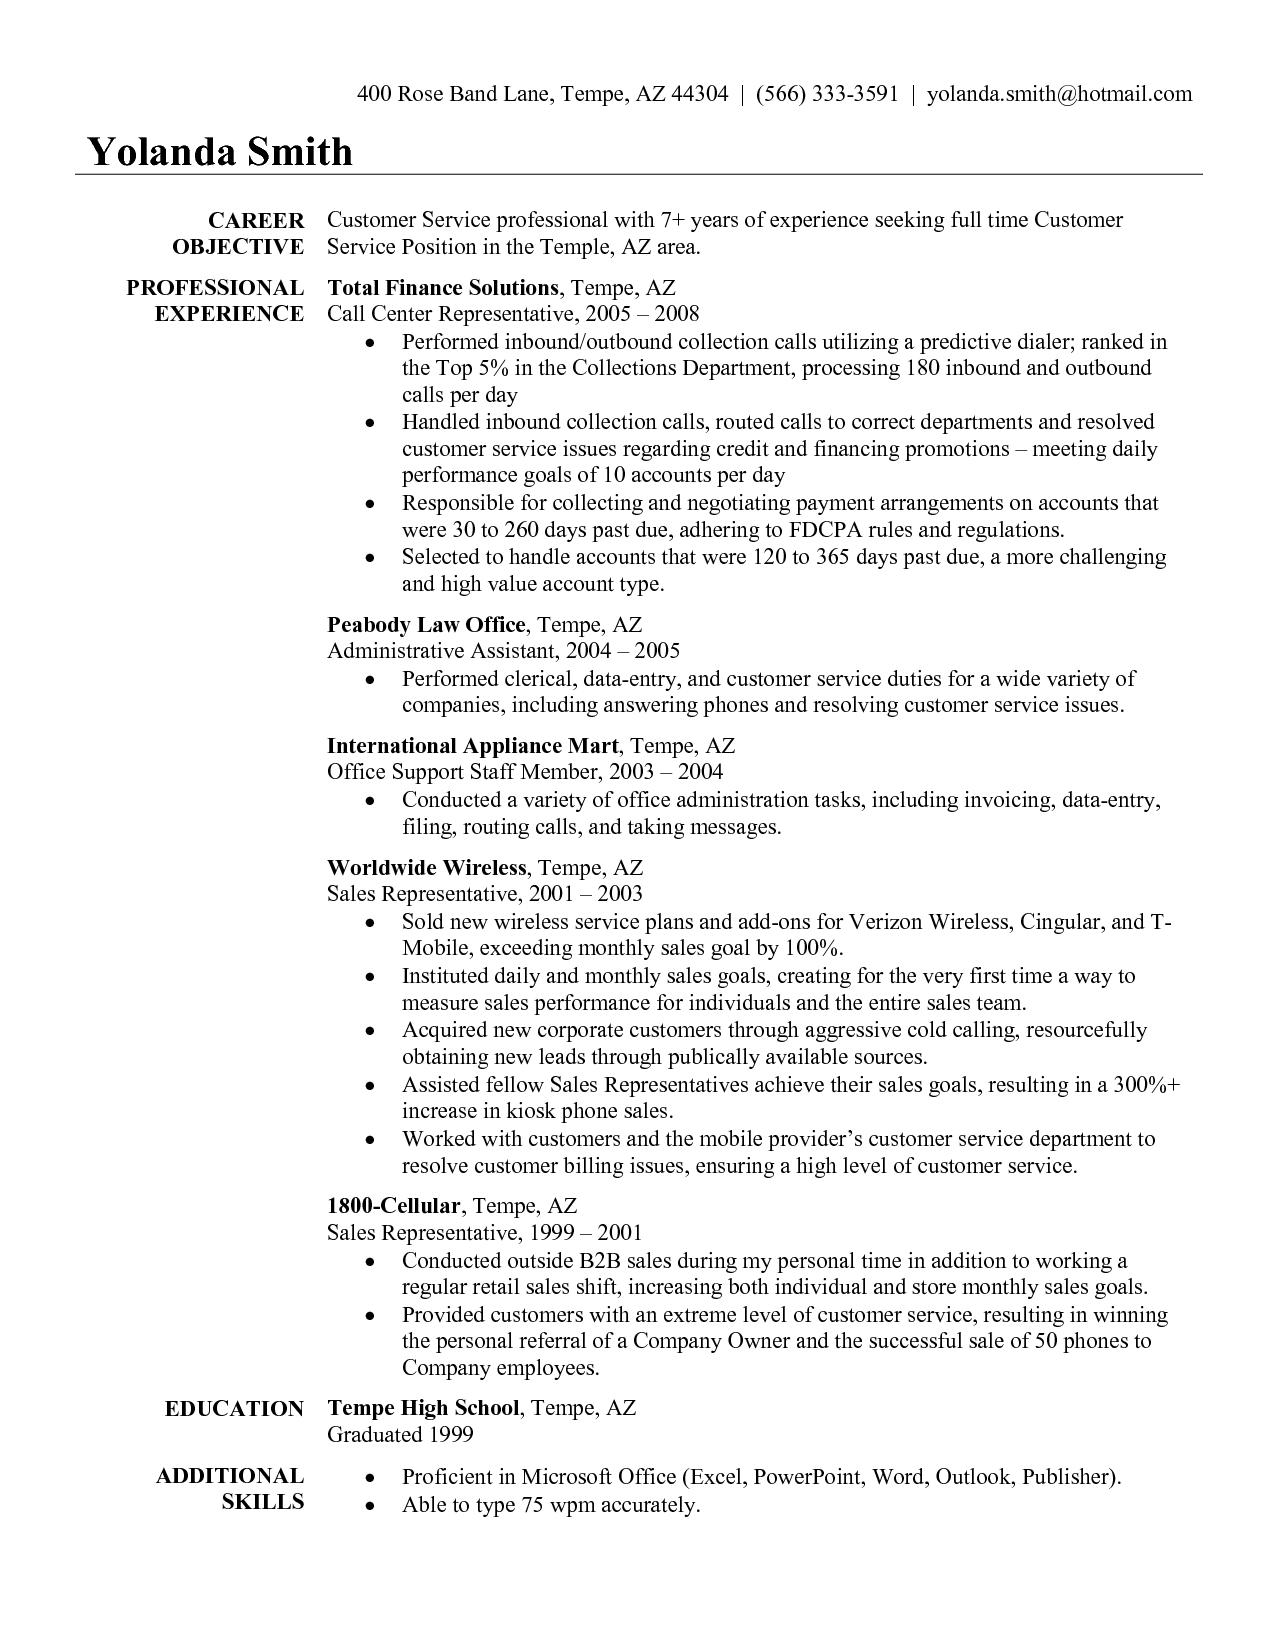 Traffic Customer Resume Examples Customer Service Resume